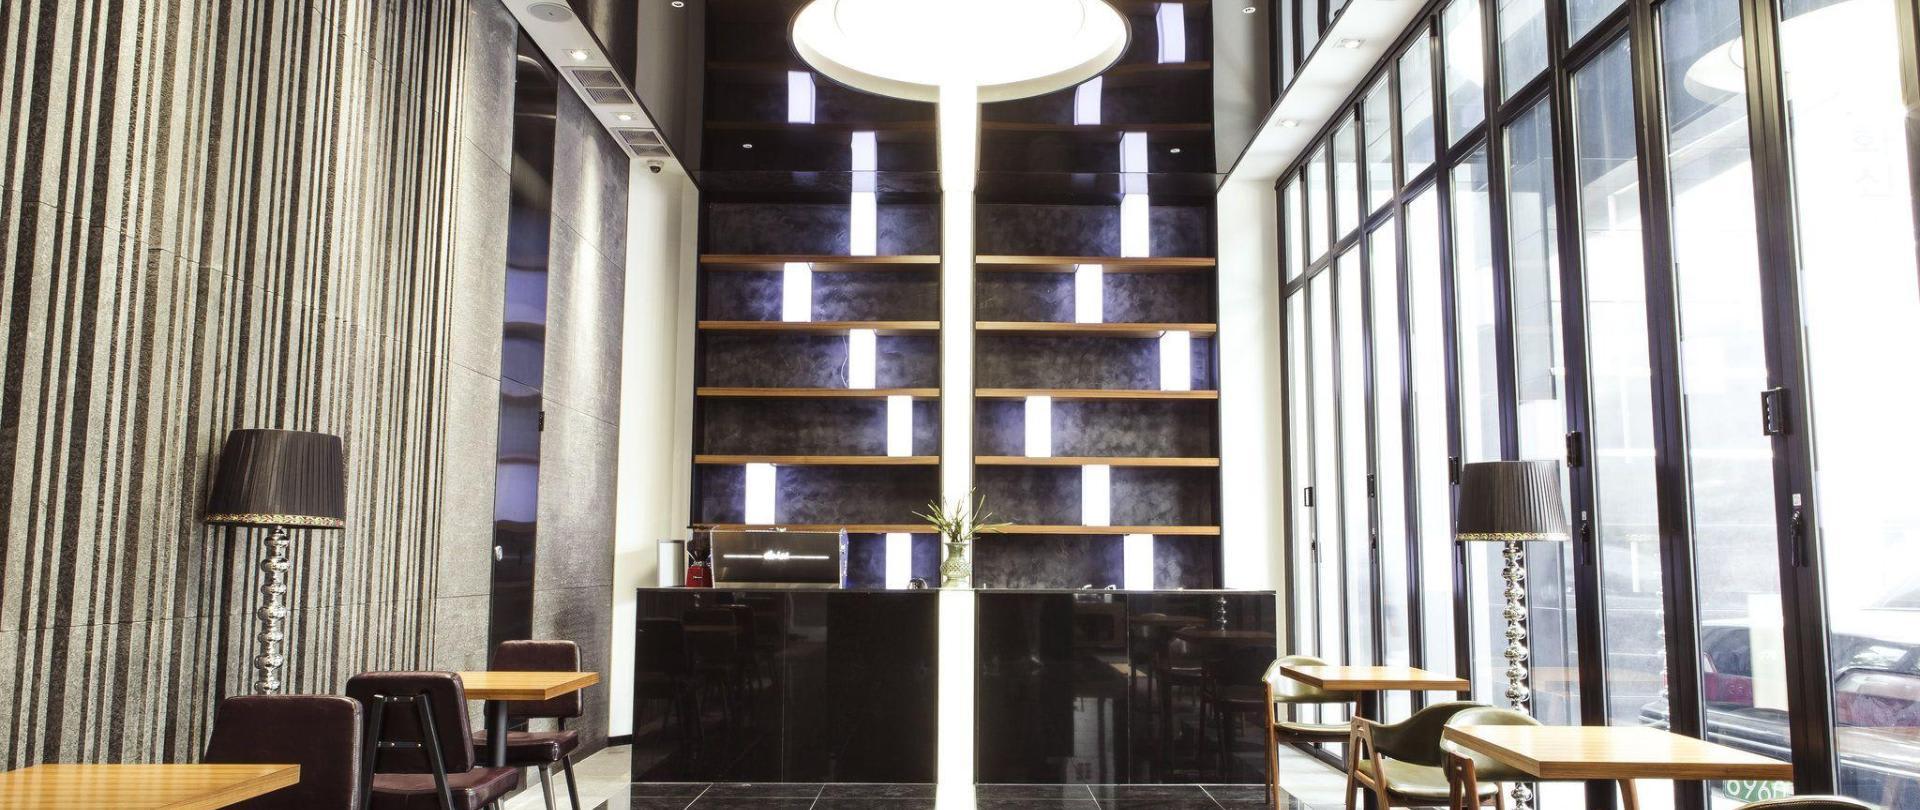 Baiton Hotel,圖片取自www.baitonseoul.com/ko-kr